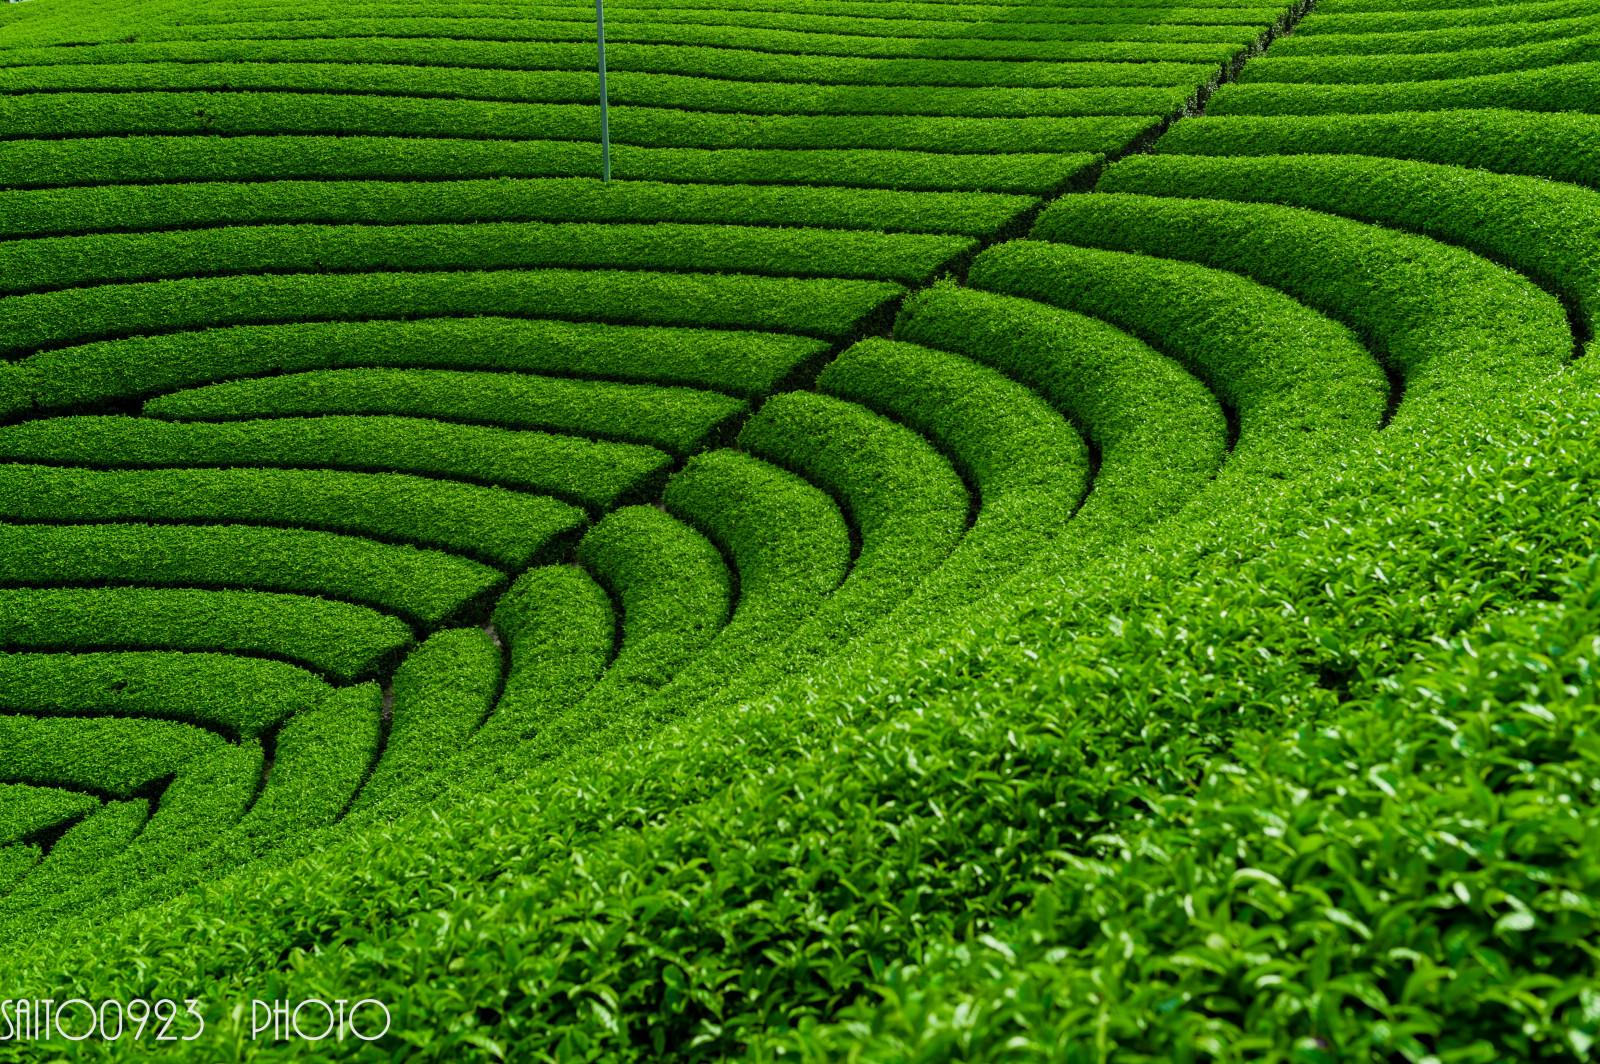 Fondos De Pantalla Japón Paisaje Césped Verde Cámara